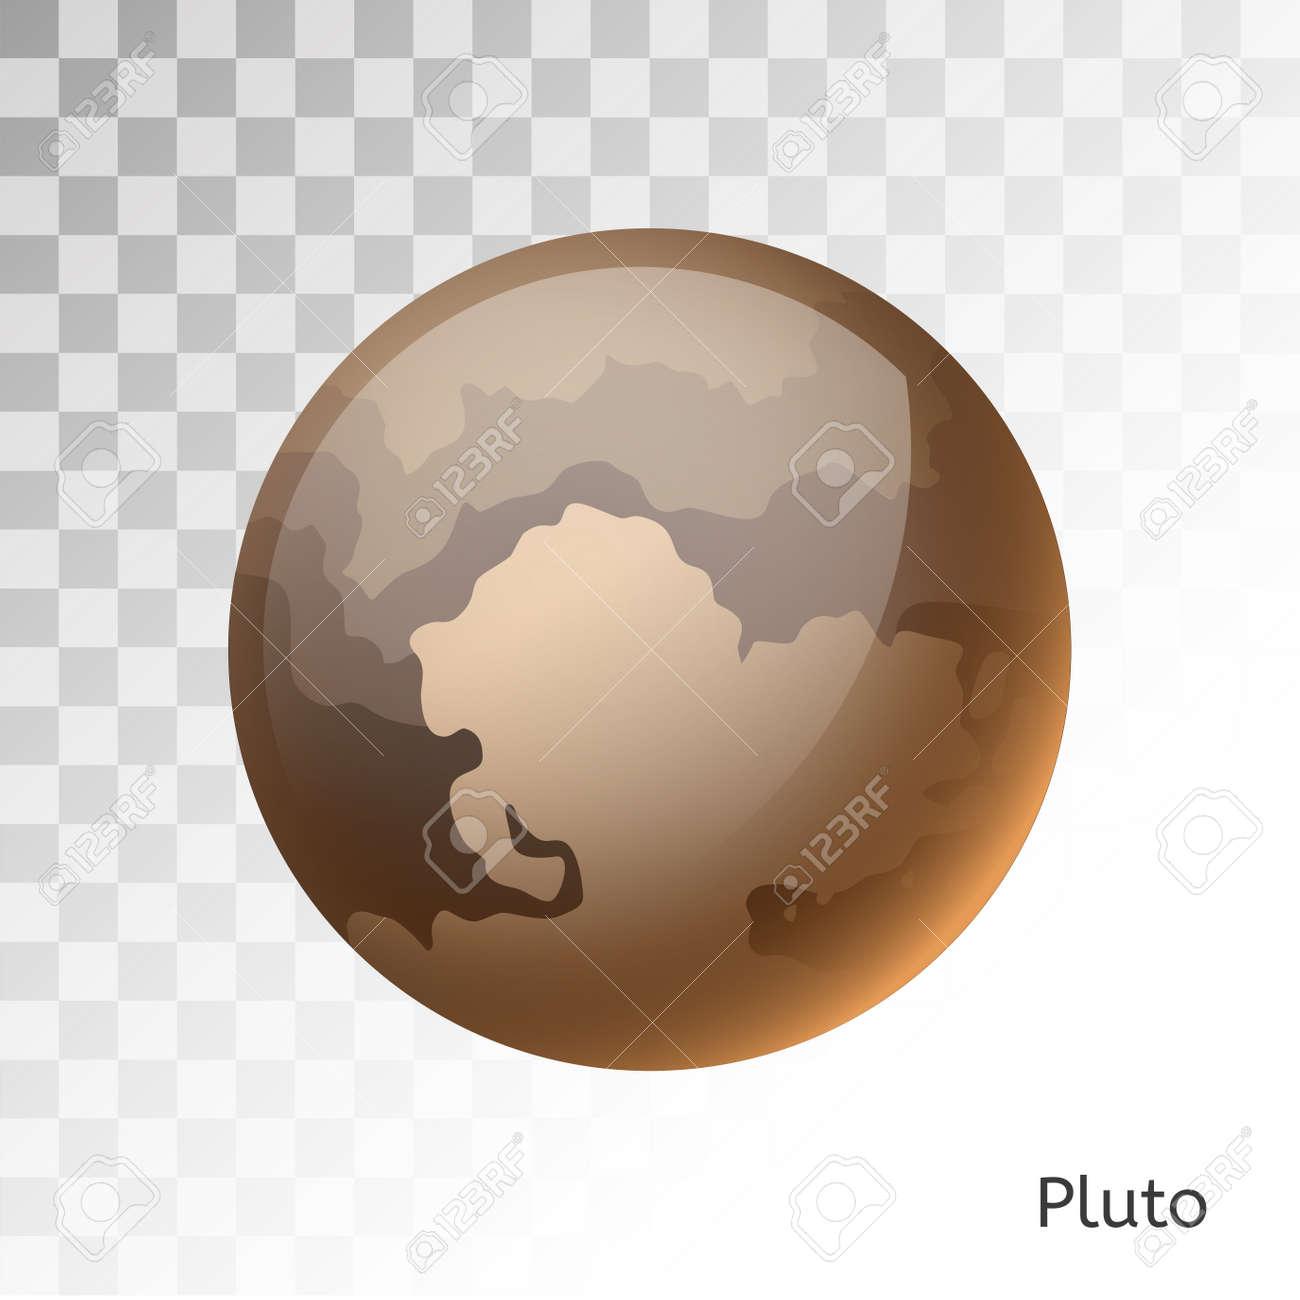 Pluto planet 3d vector illustration  Globe Pluto texture map